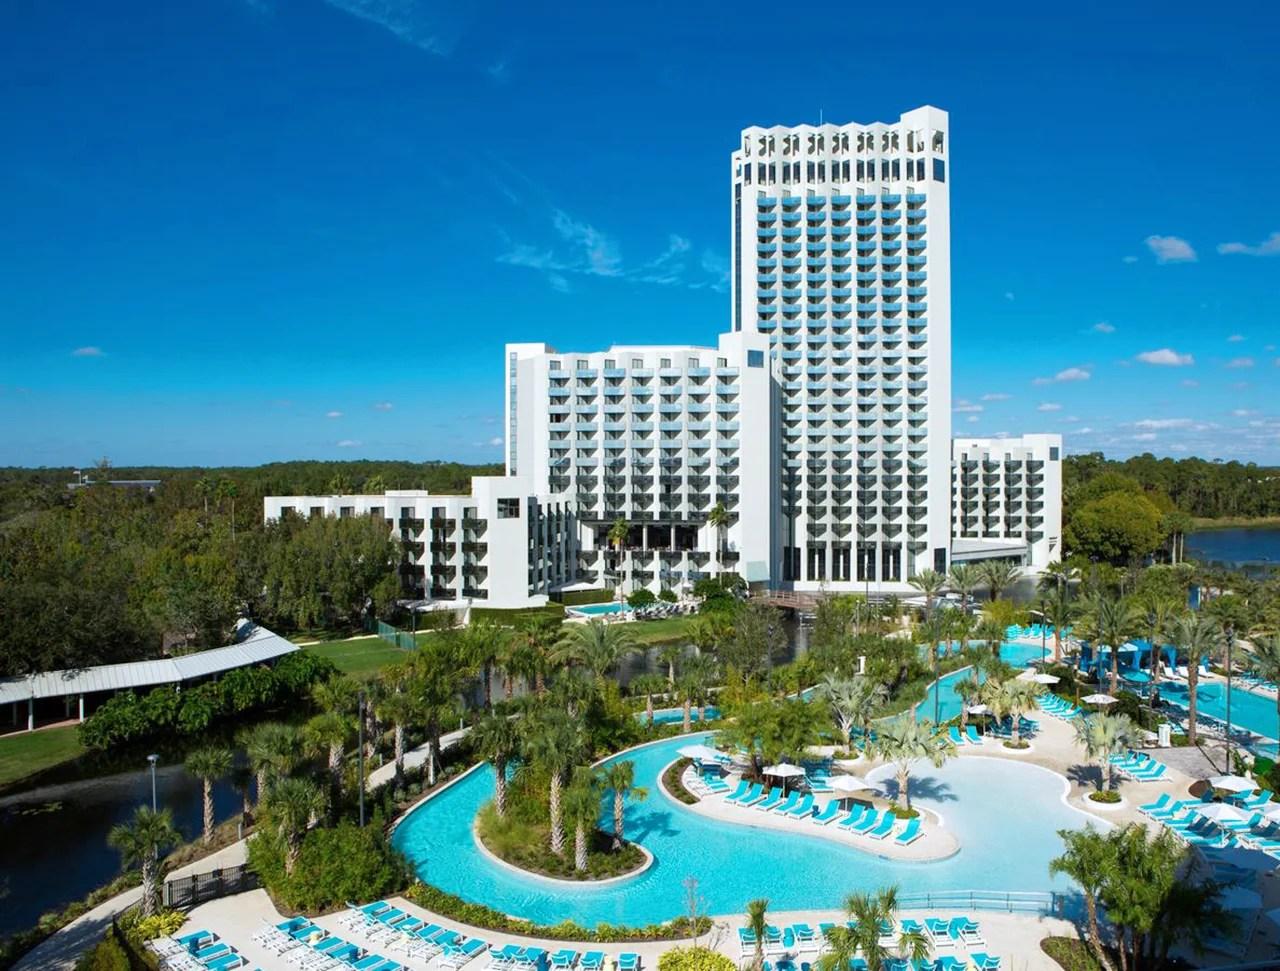 Disney Springs Hotels: Disney Benefits at Bargain Prices